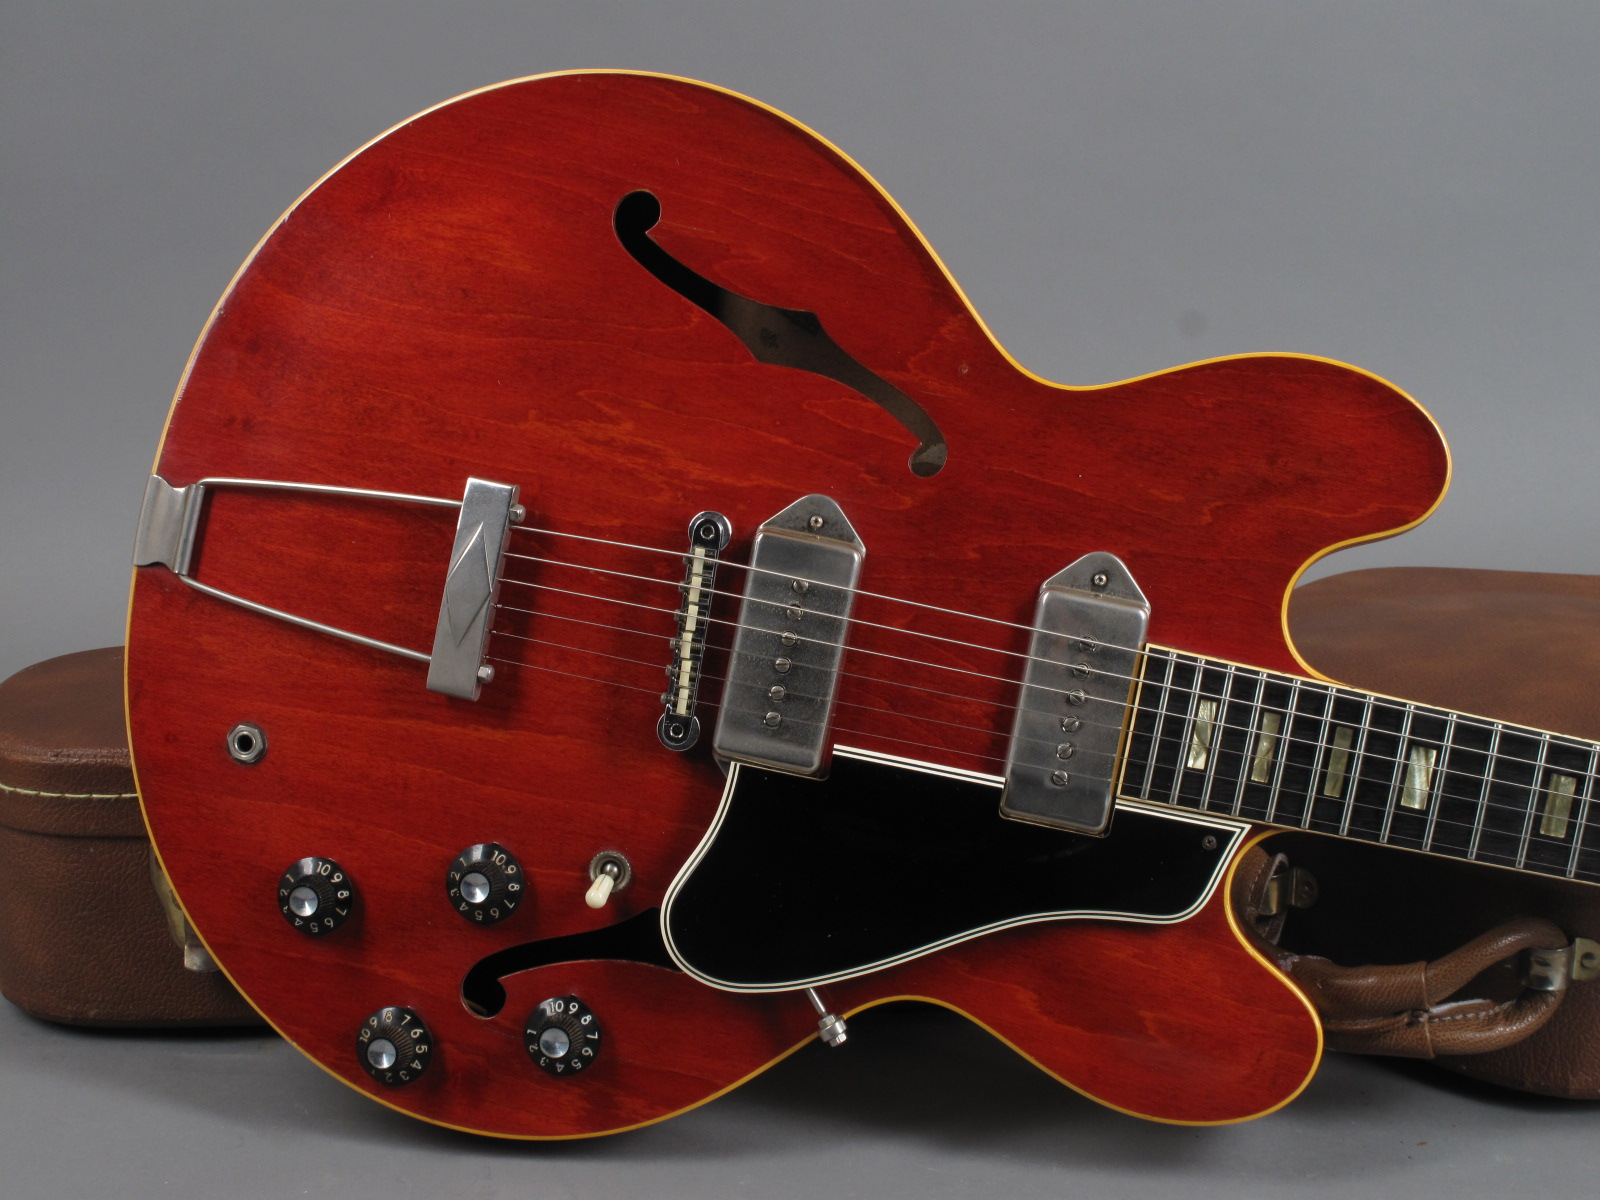 https://guitarpoint.de/app/uploads/products/1963-gibson-es-330-tdc-cherry/1963-Gibson-ES-330TDC-104411-15_1.jpg